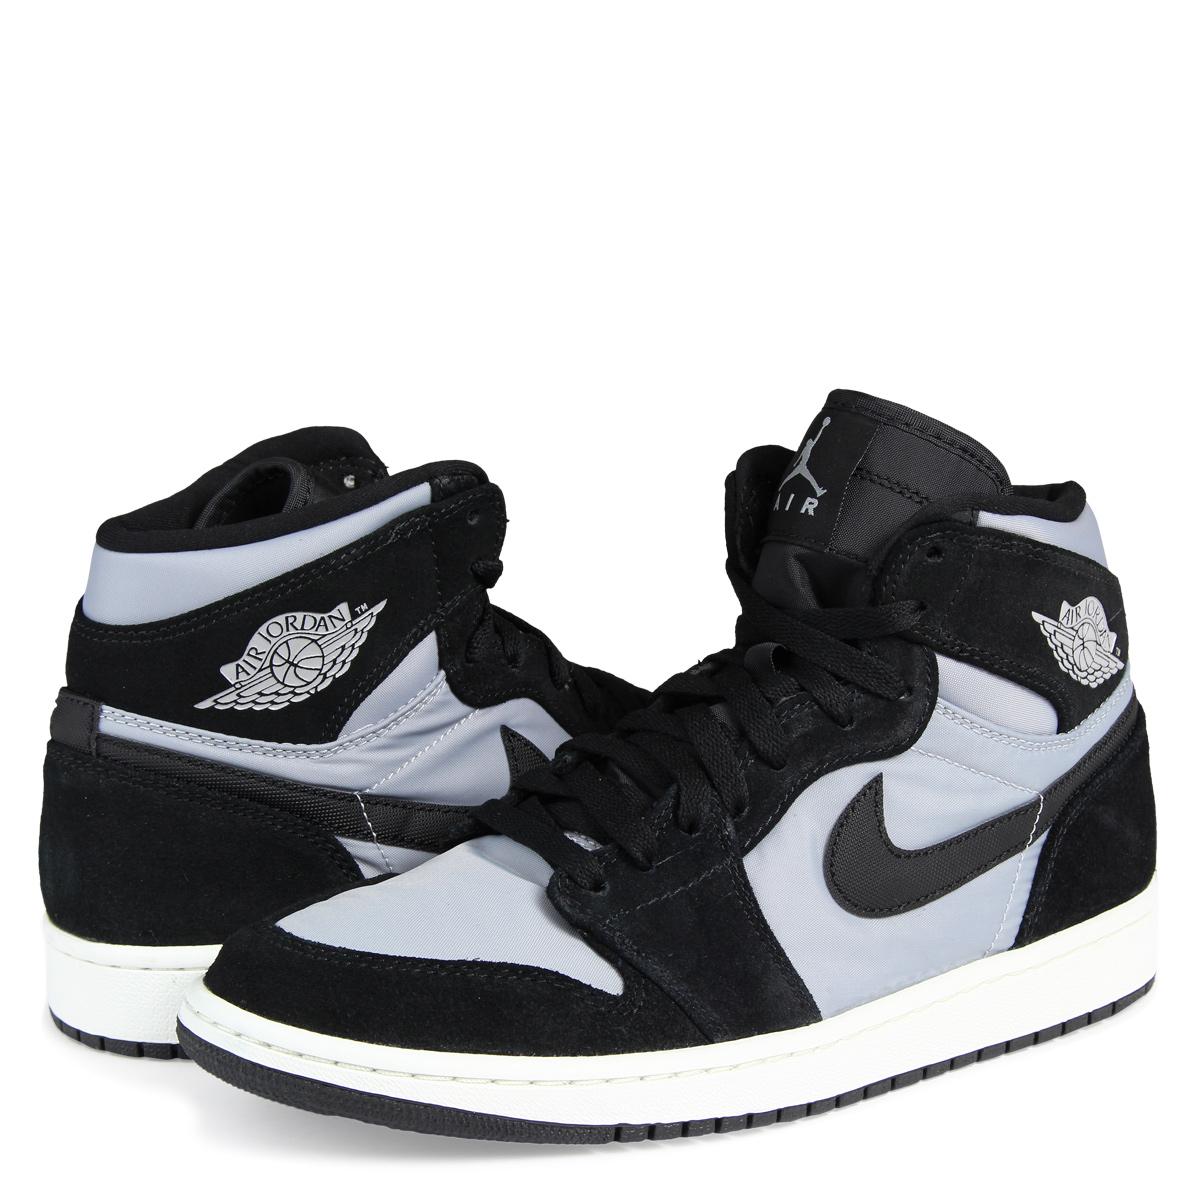 665b47b176802 Whats up Sports  NIKE AIR JORDAN 1 RETRO HIGH PREMIUM Nike Air Jordan 1  nostalgic high sneakers AA3993-003 men shoes black  10 16 Shinnyu load